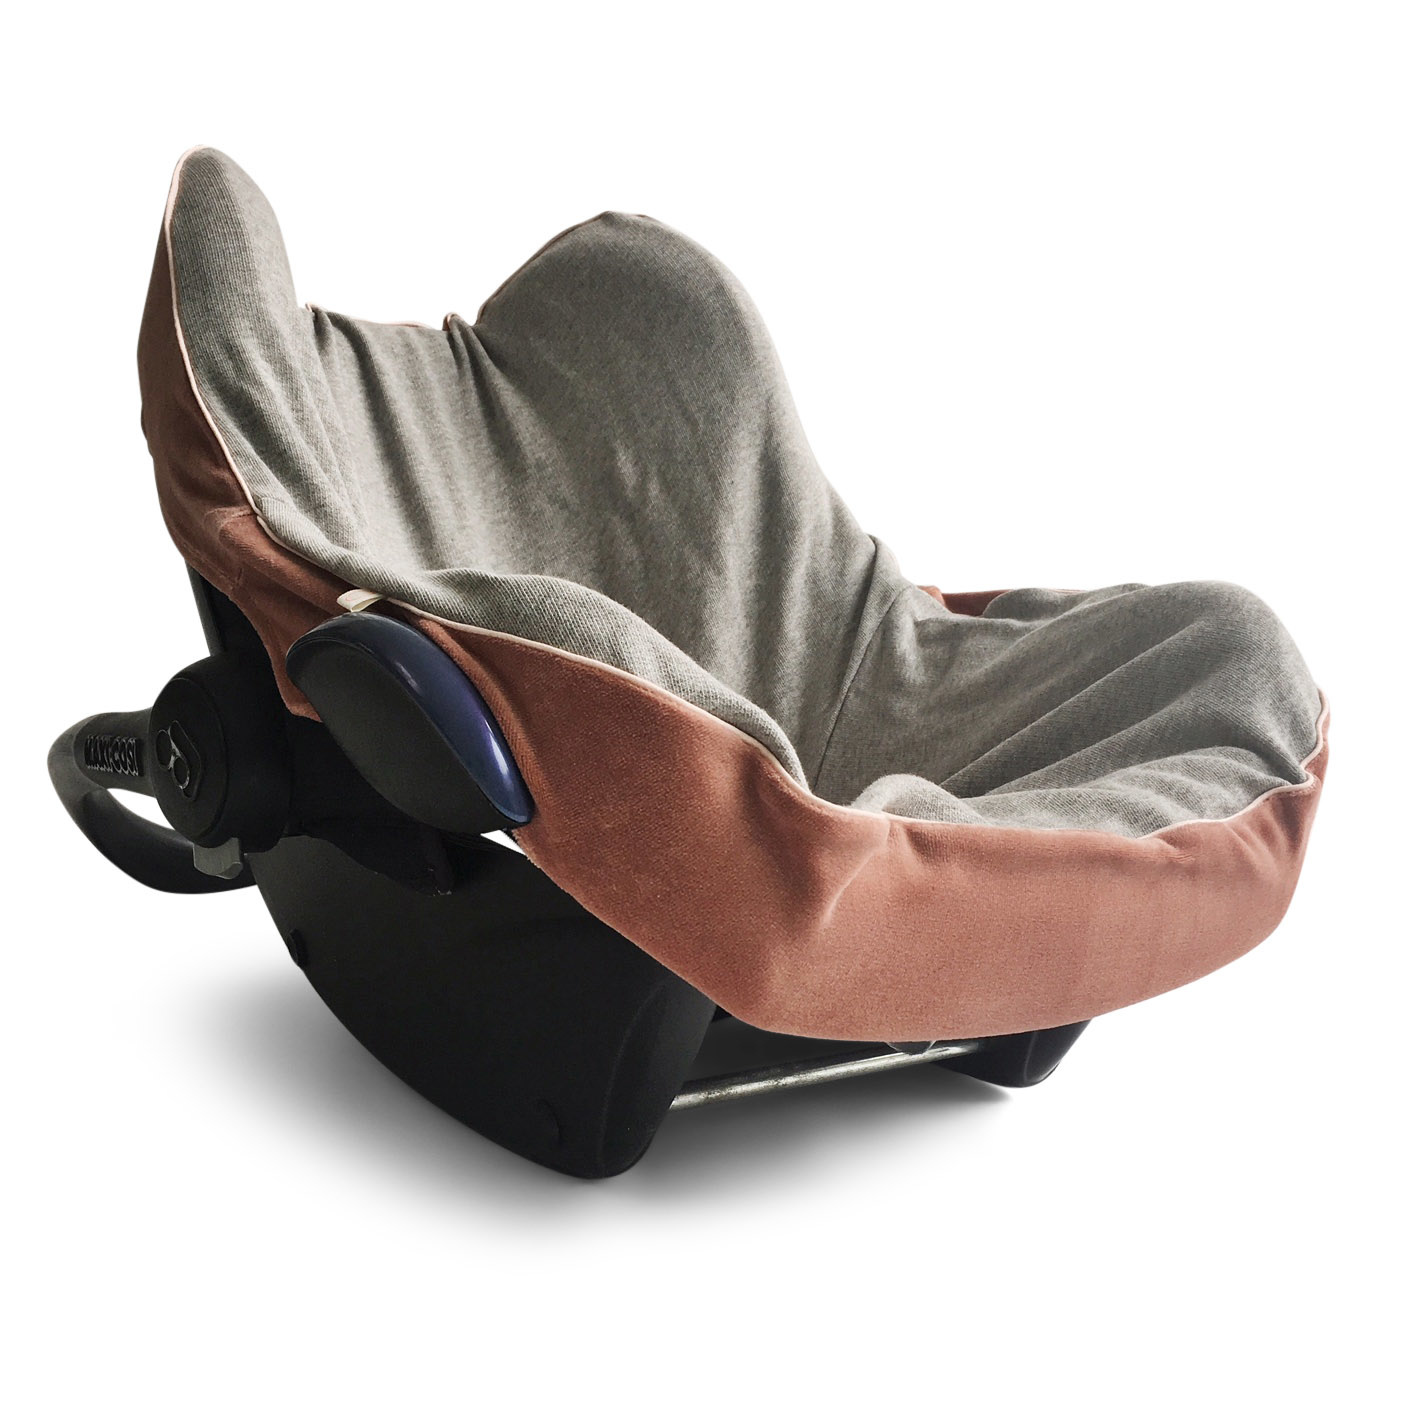 Hoes autostoel maxi cosi la croisette-1